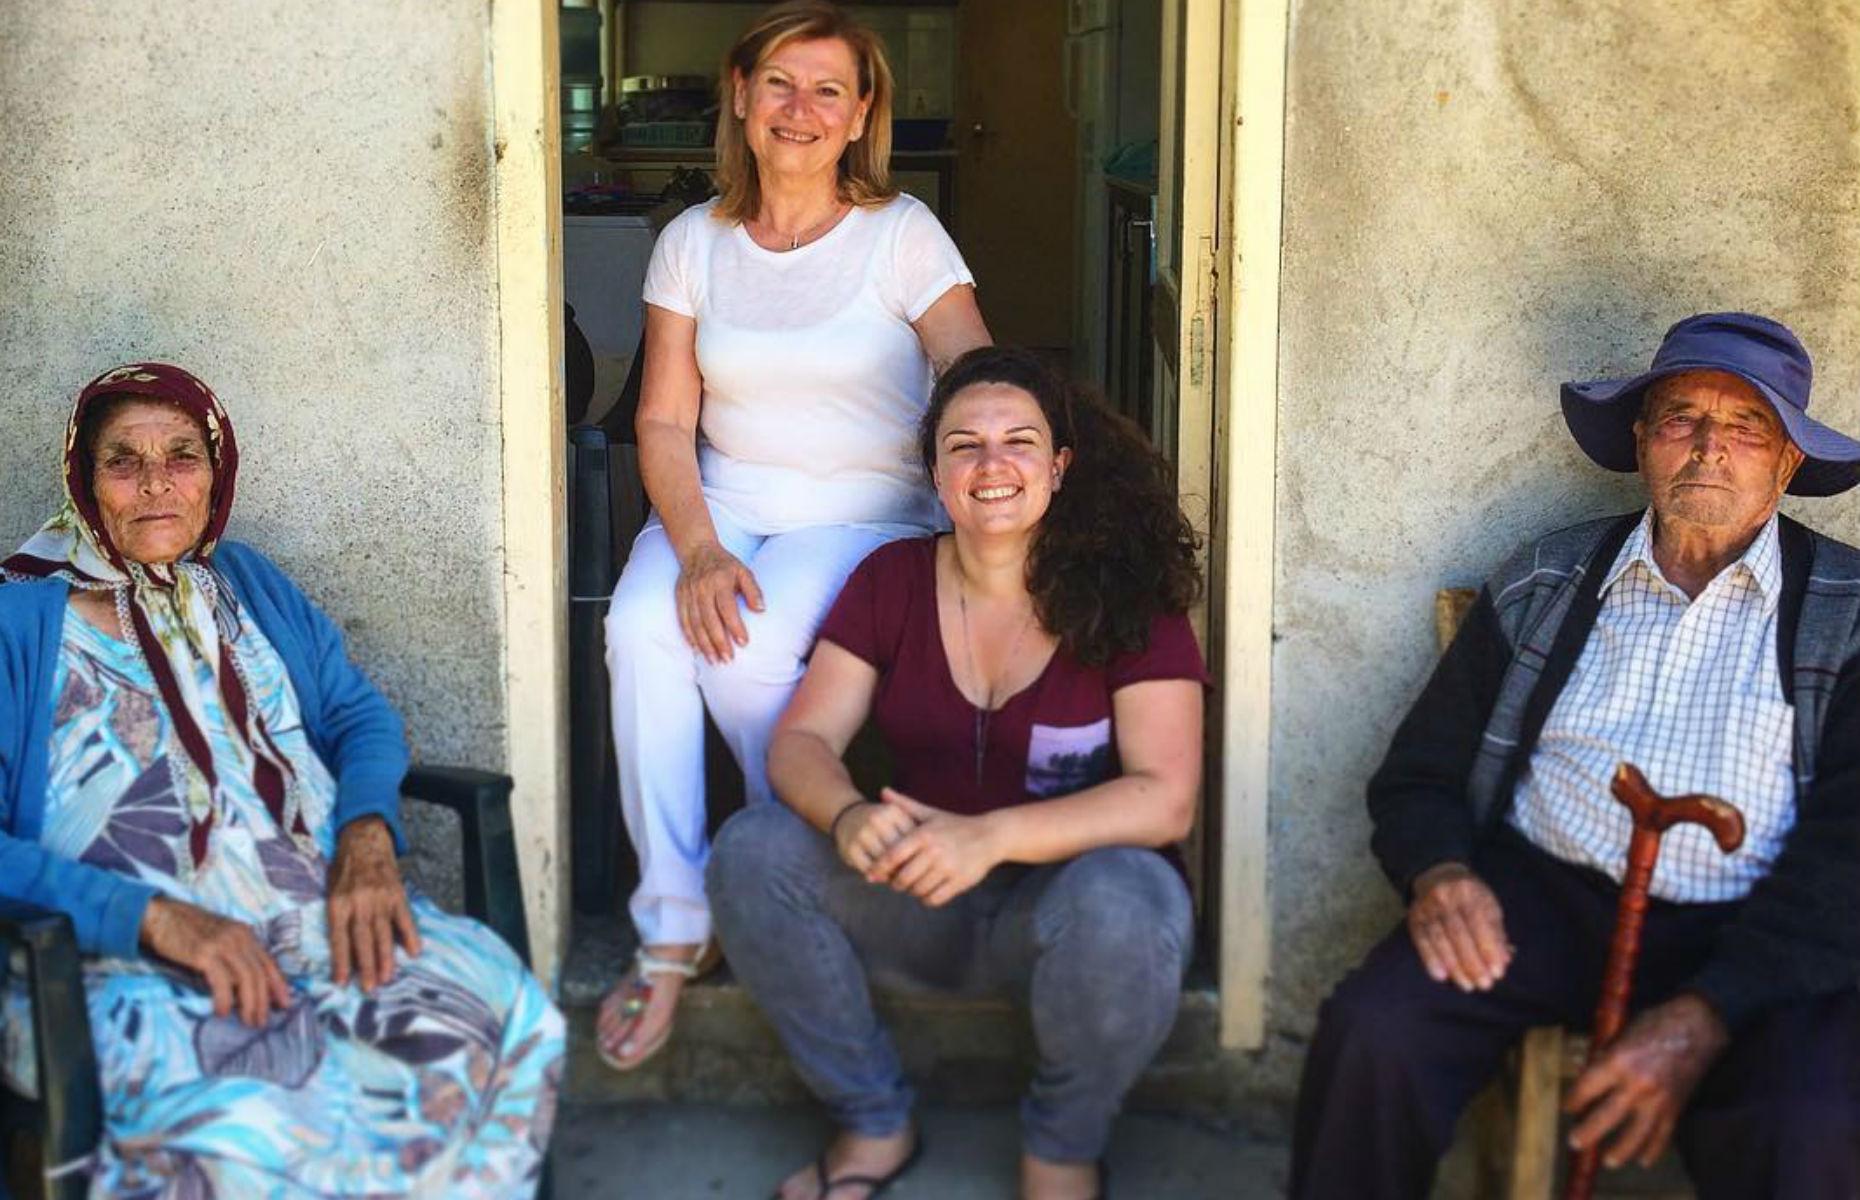 Selin Kiazim with her grandparents in Cyprus